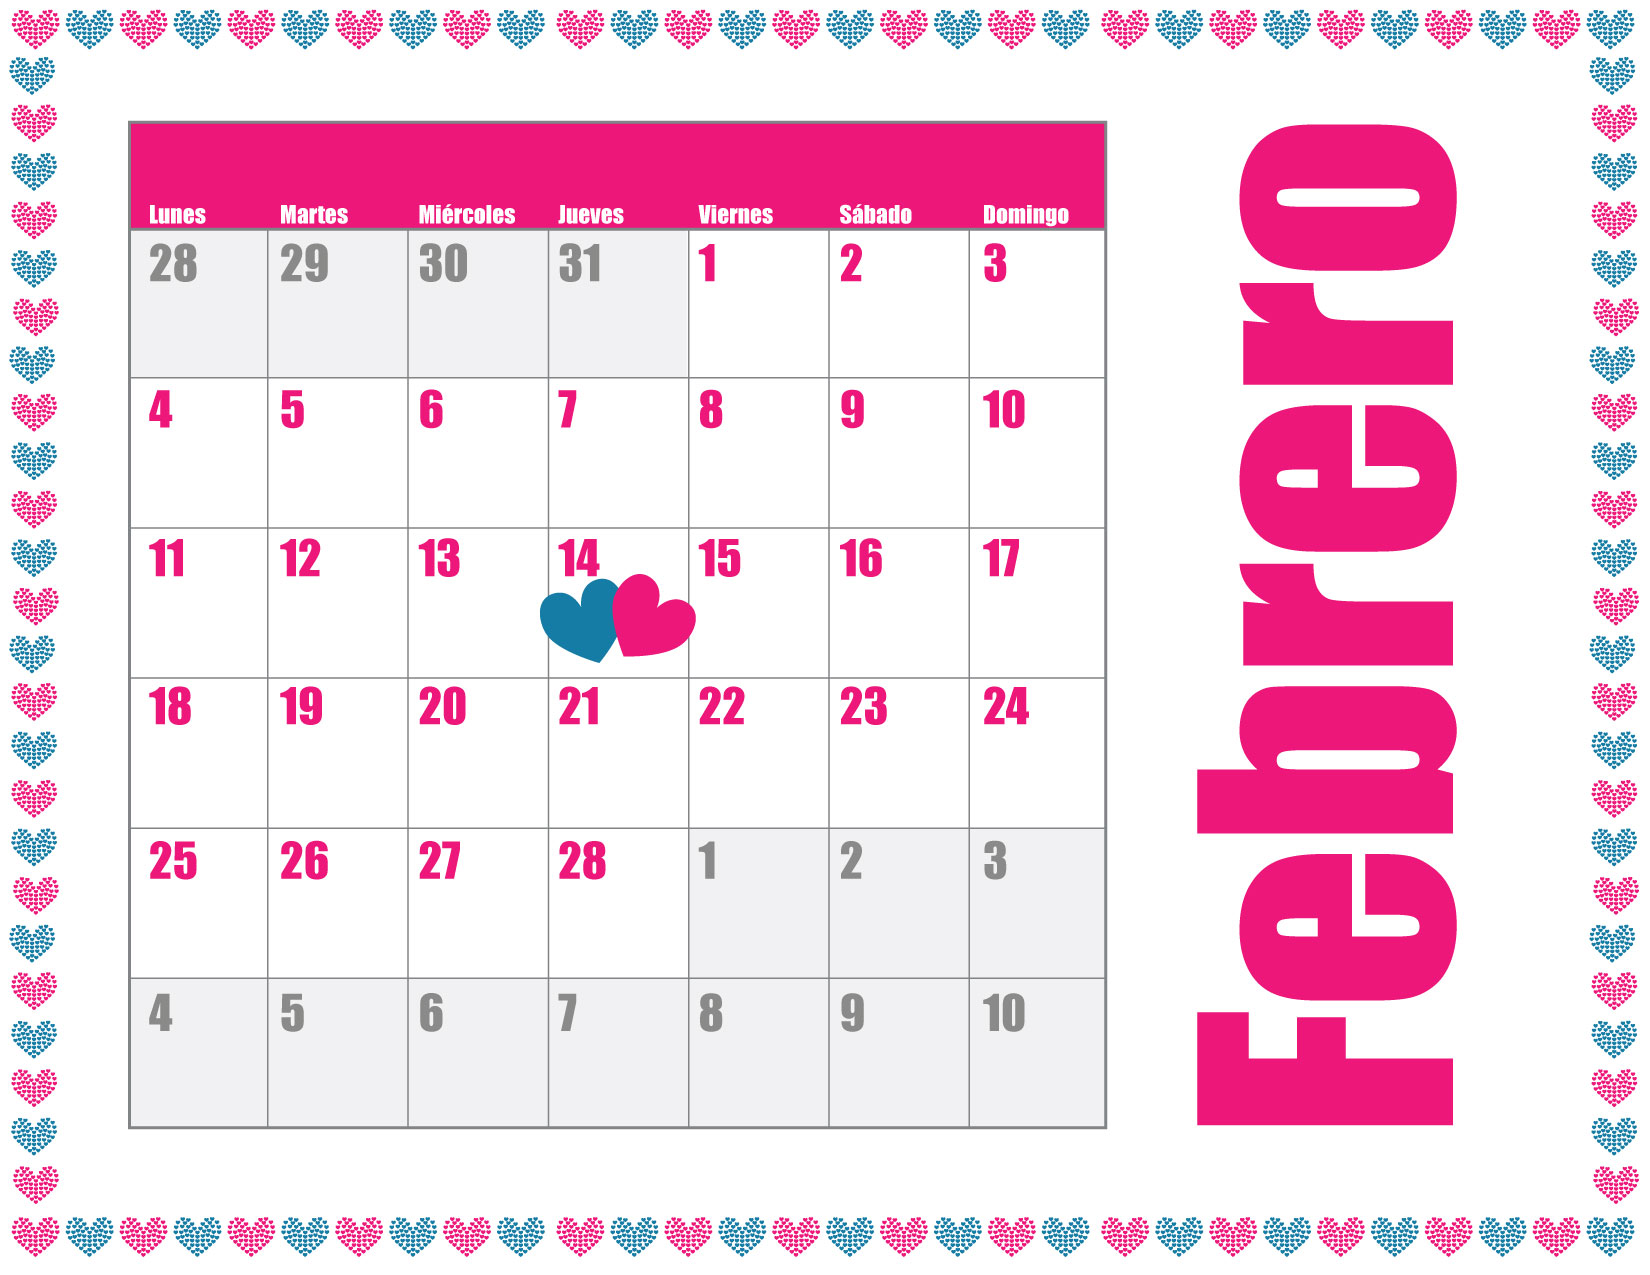 Calendario de febrero 2013 para imprimir